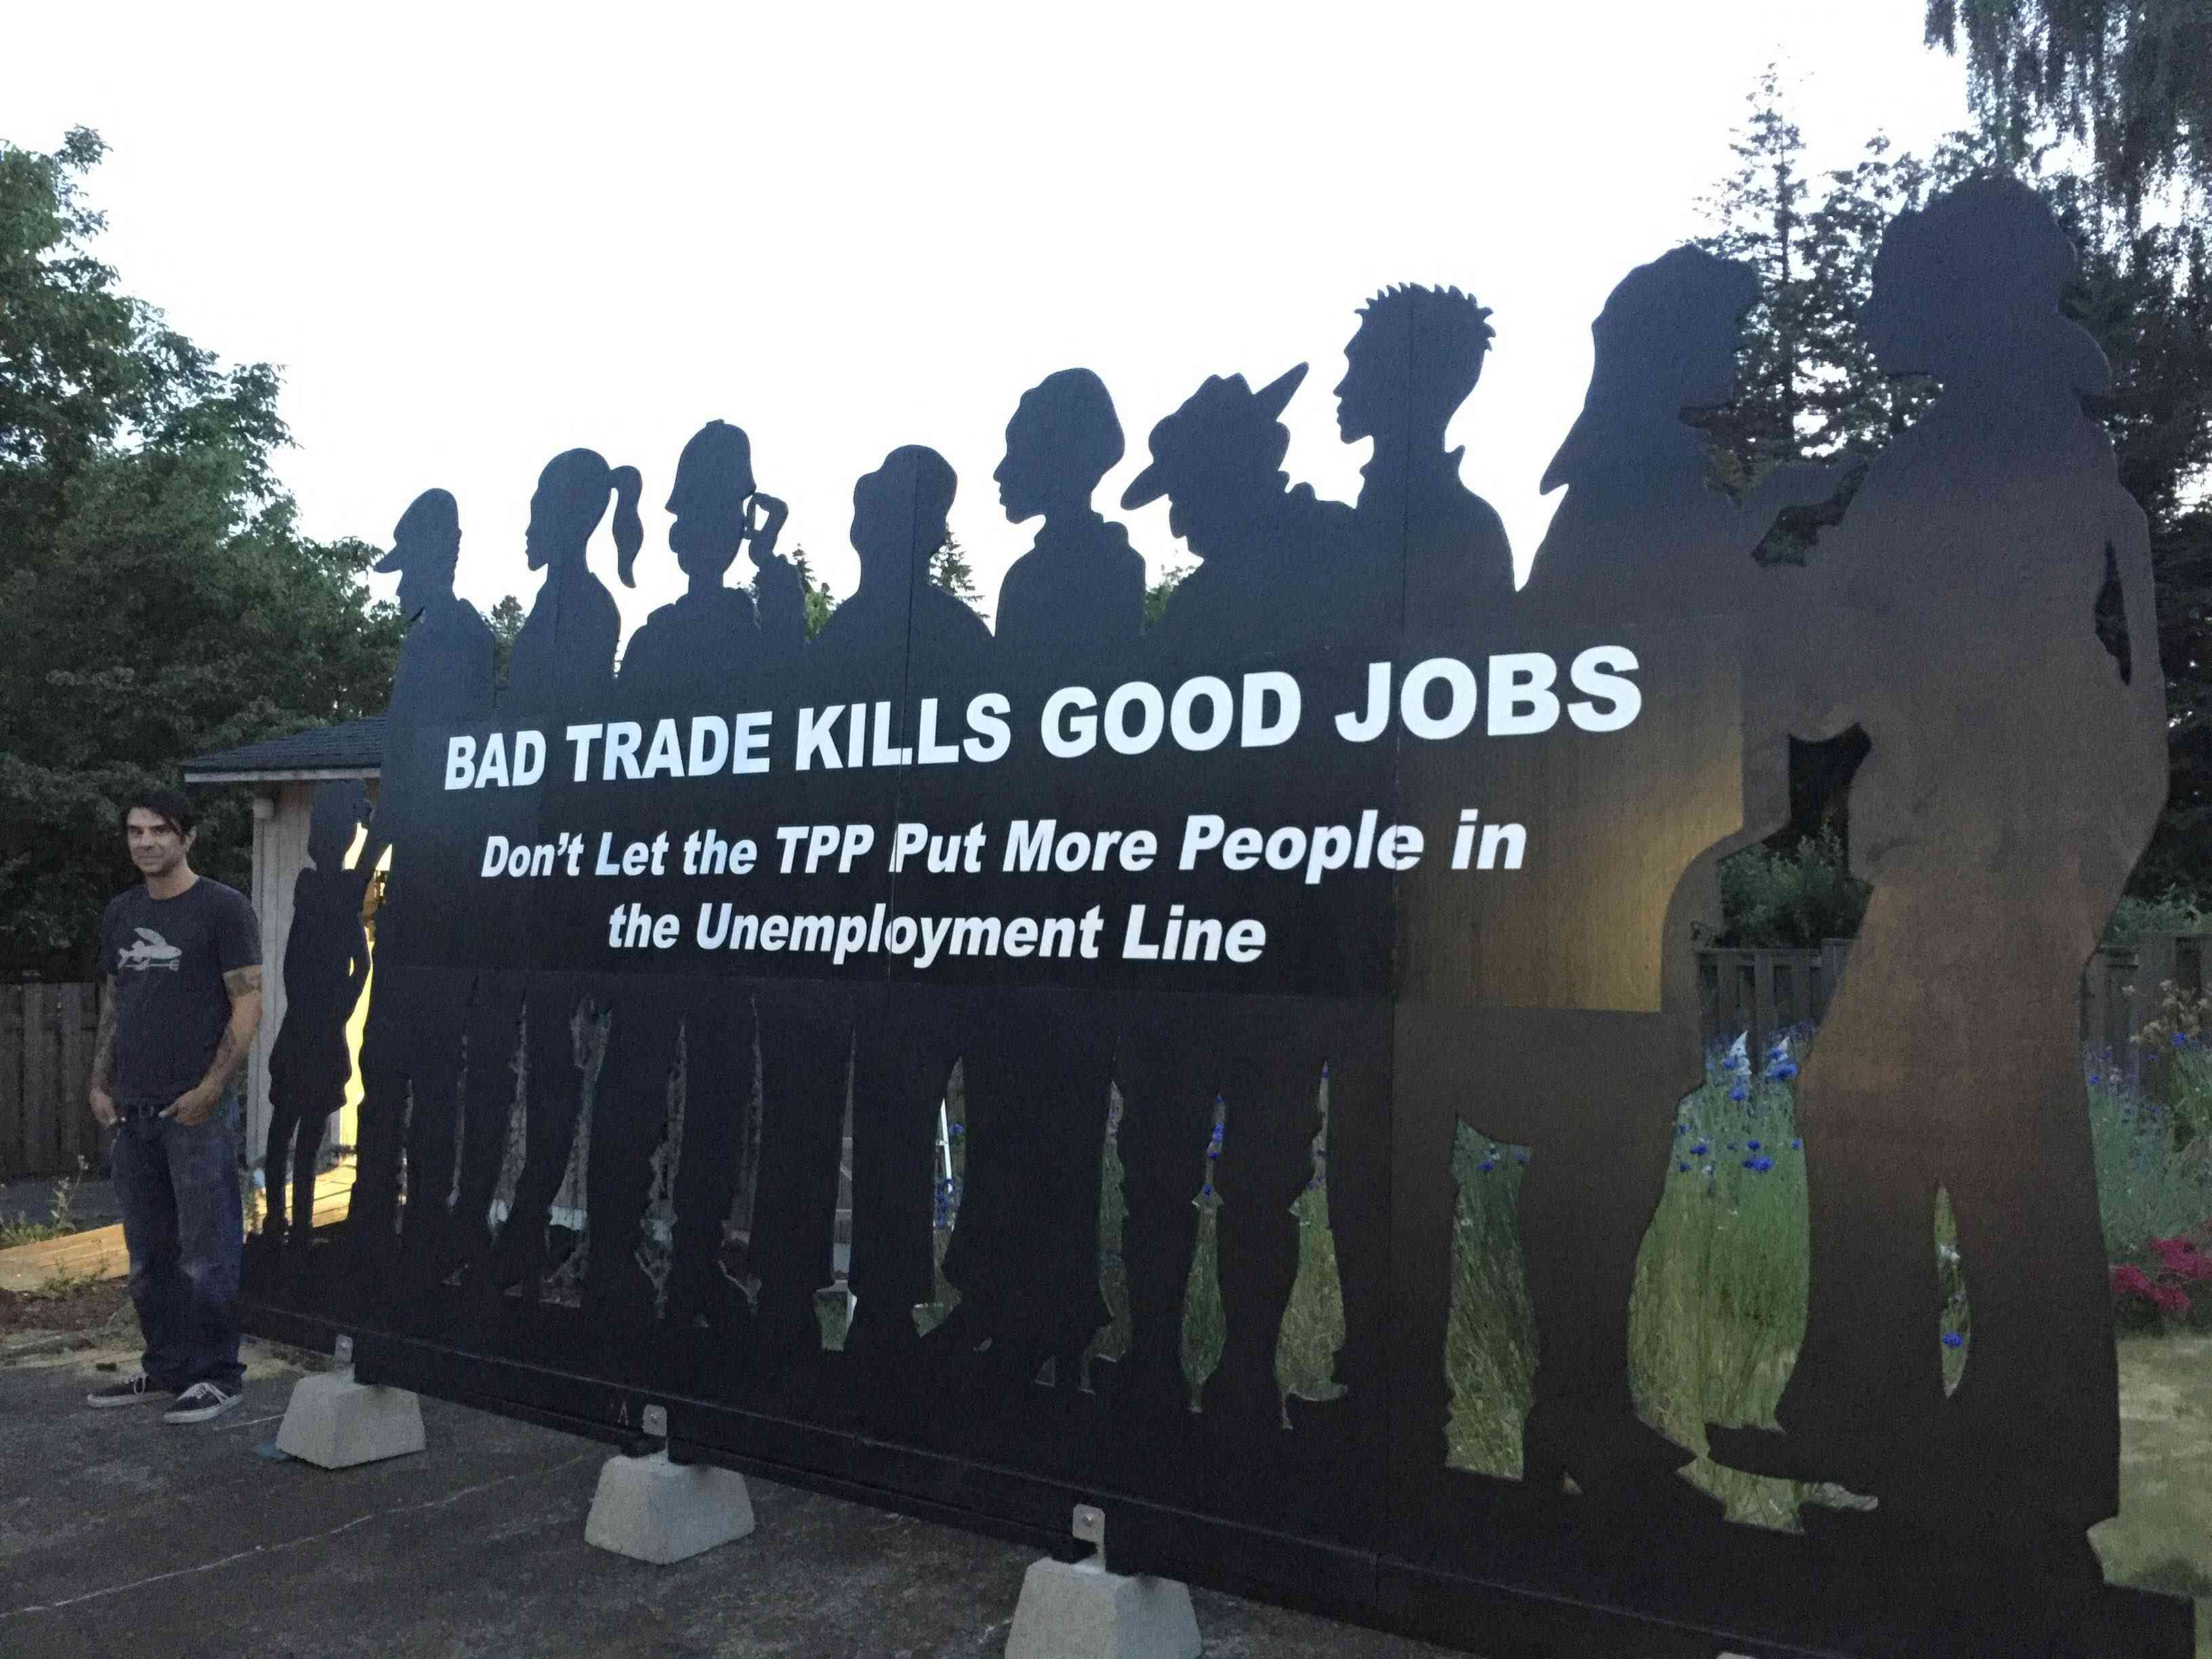 Bad Trade Kills Good Jobs - The #StopTPP Prop Tour